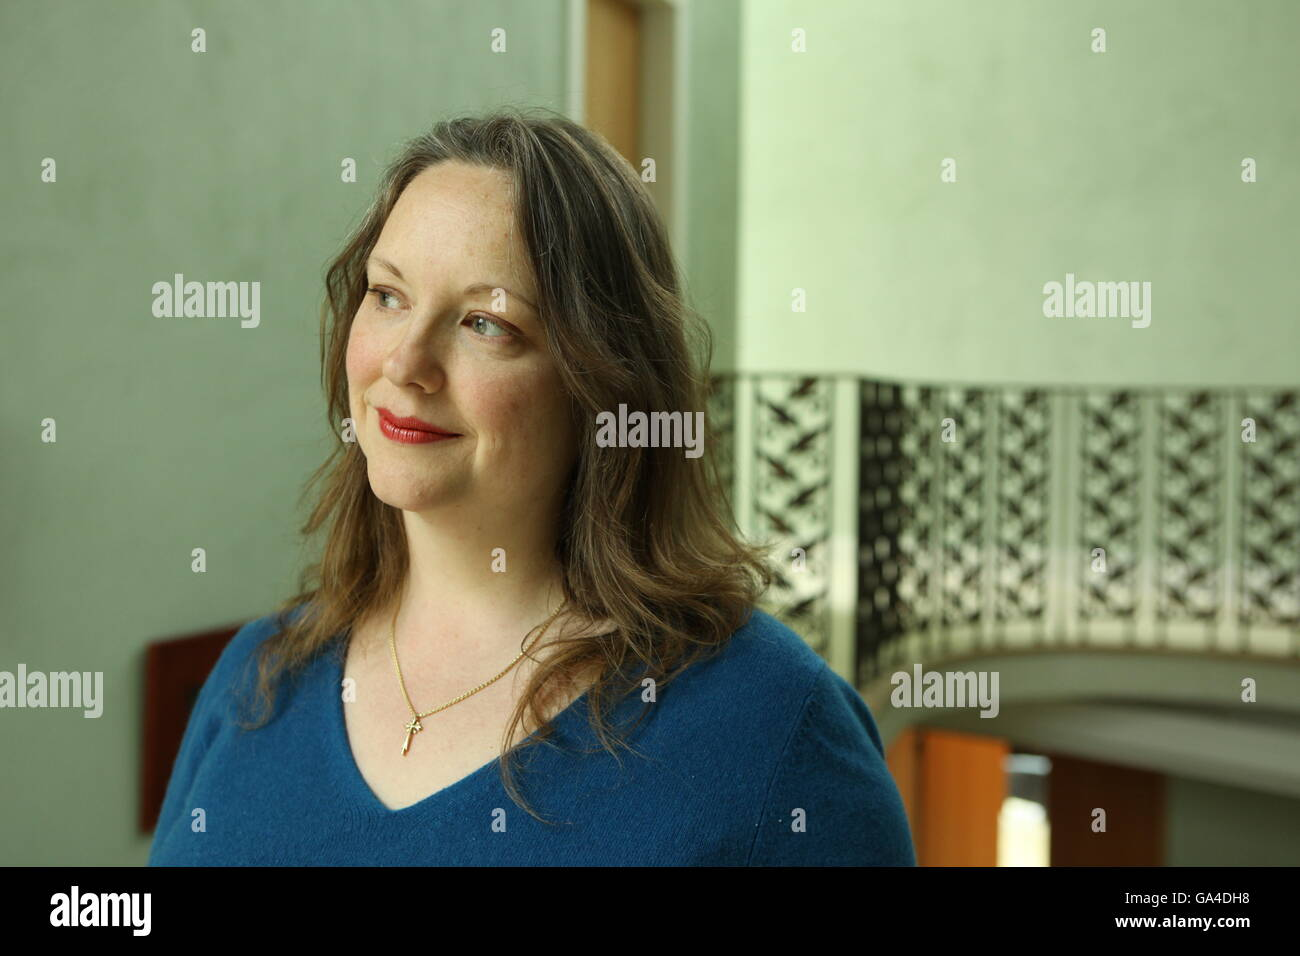 Angelique Rockas,Rosina Fernhoff Adult clips Pamela Adlon,Chipo Chung